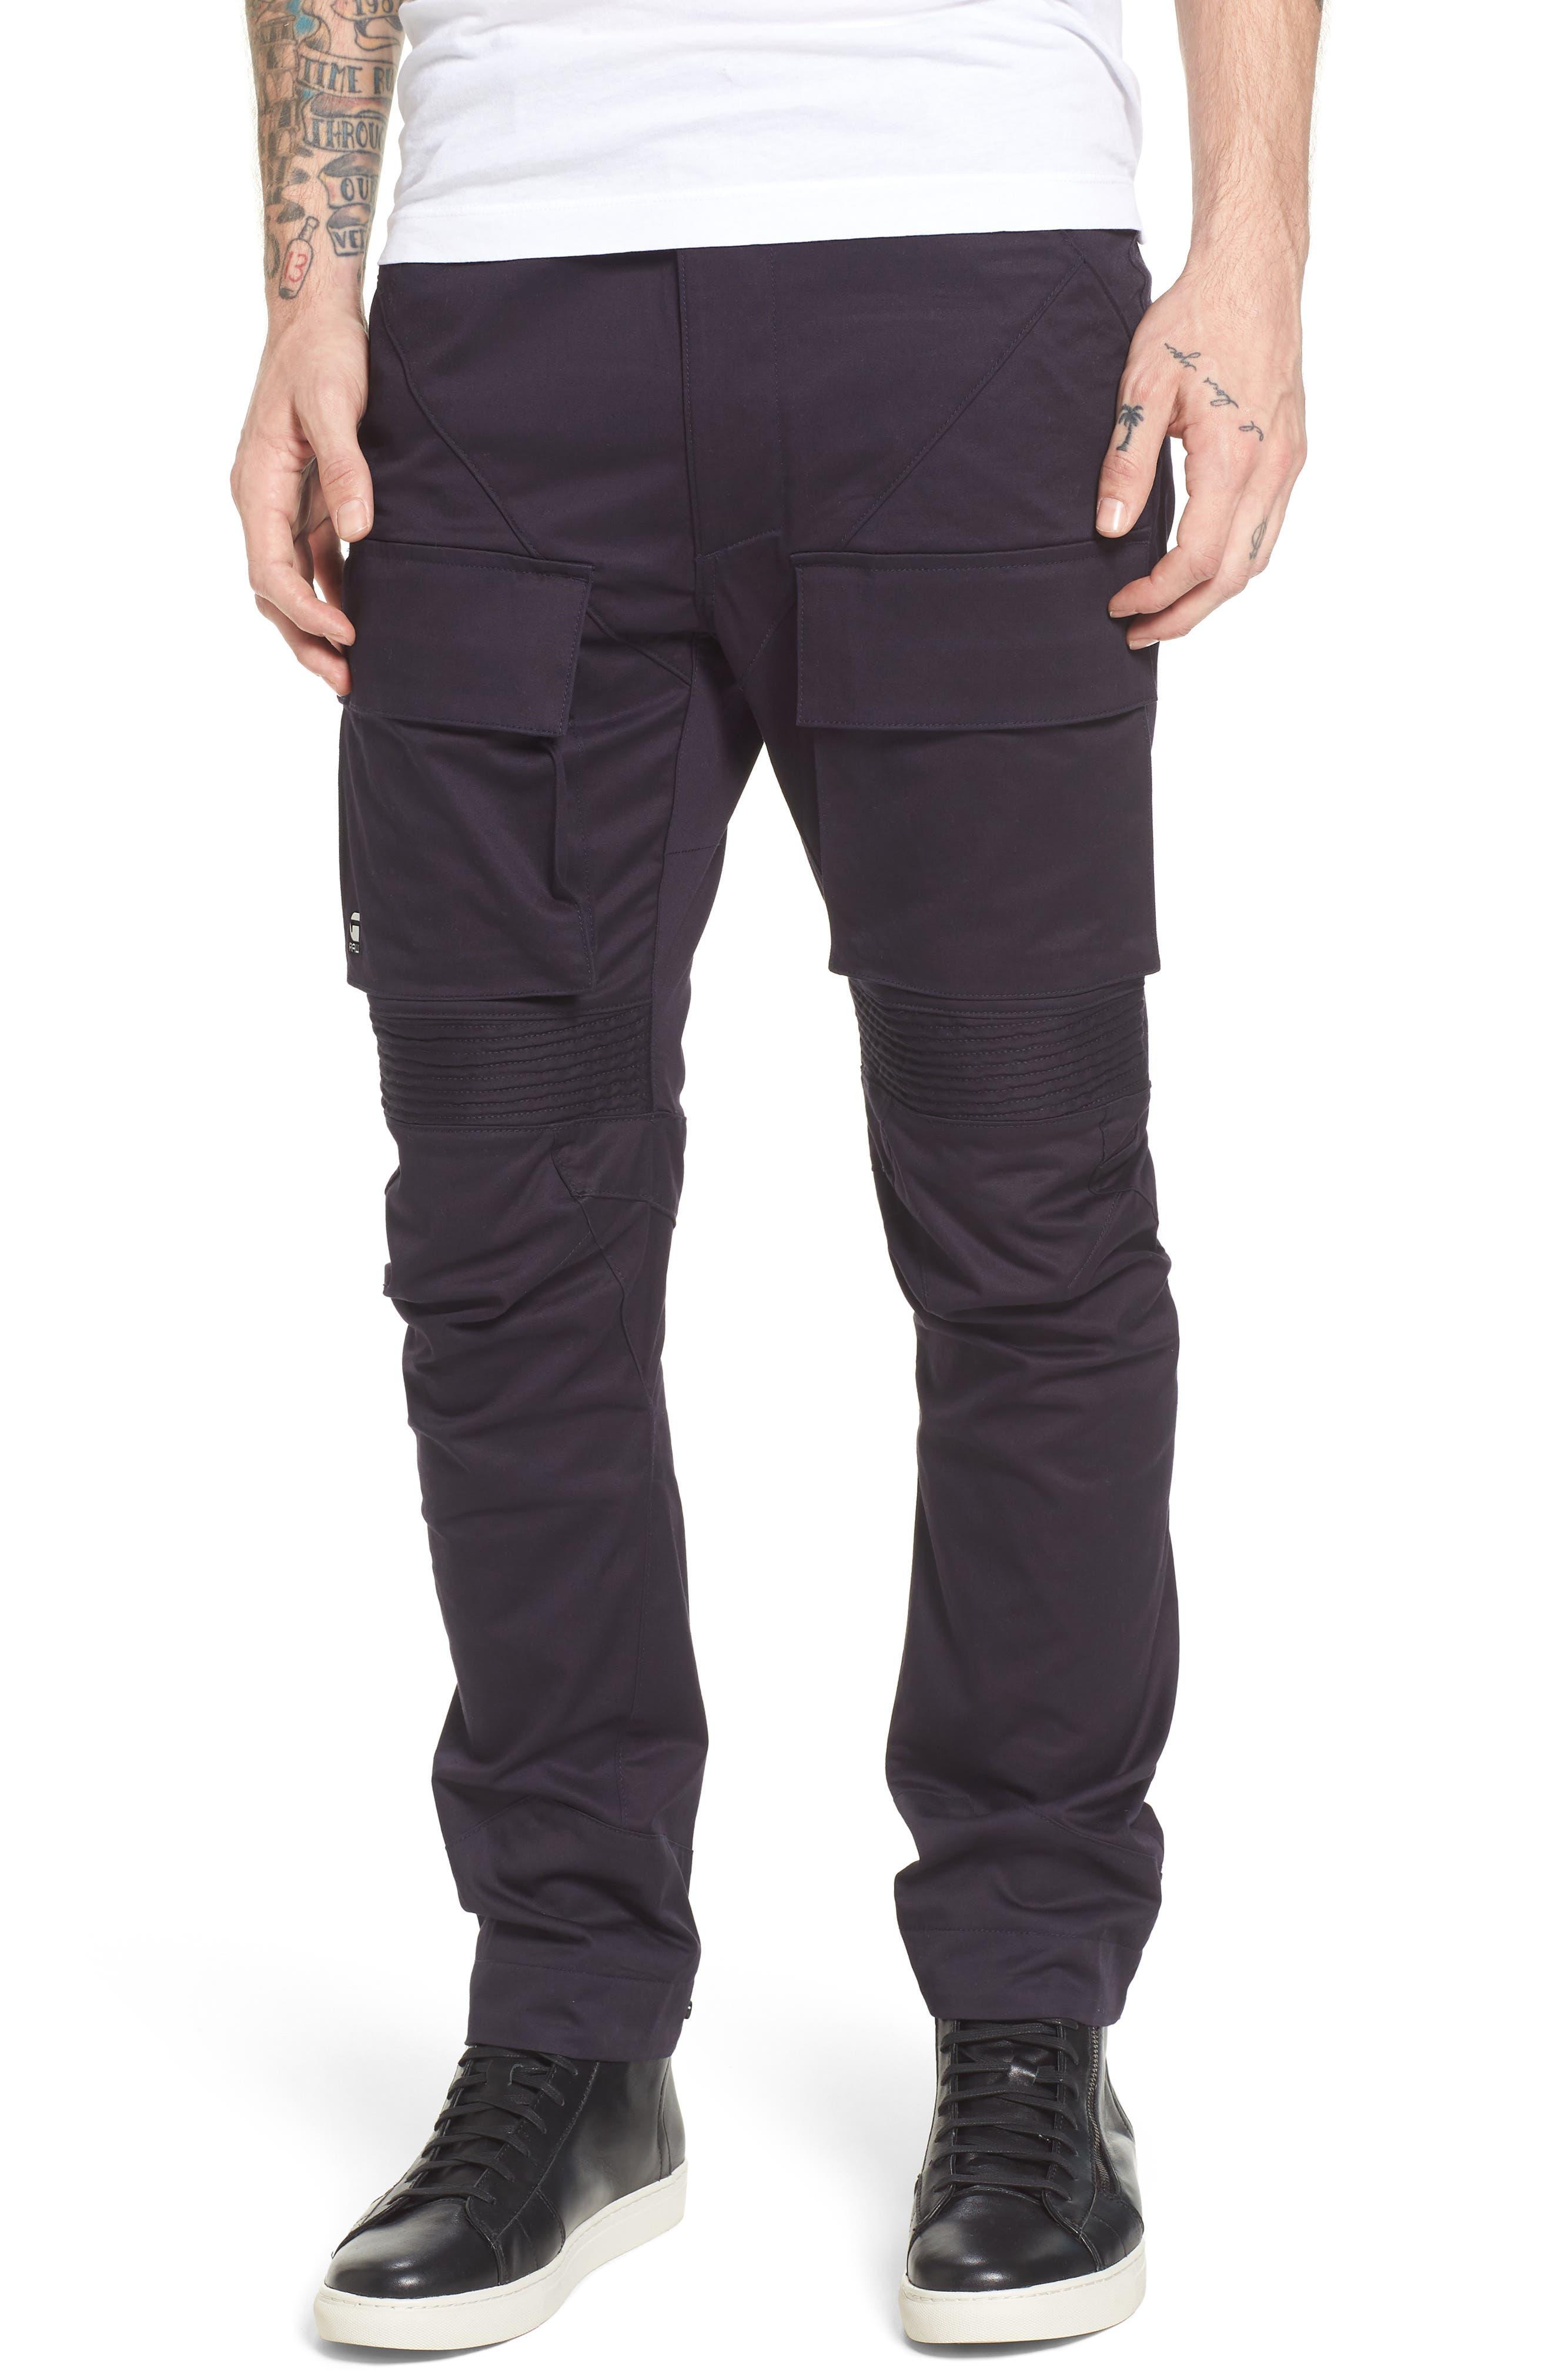 Vodan DC Slim Pants,                             Main thumbnail 1, color,                             400